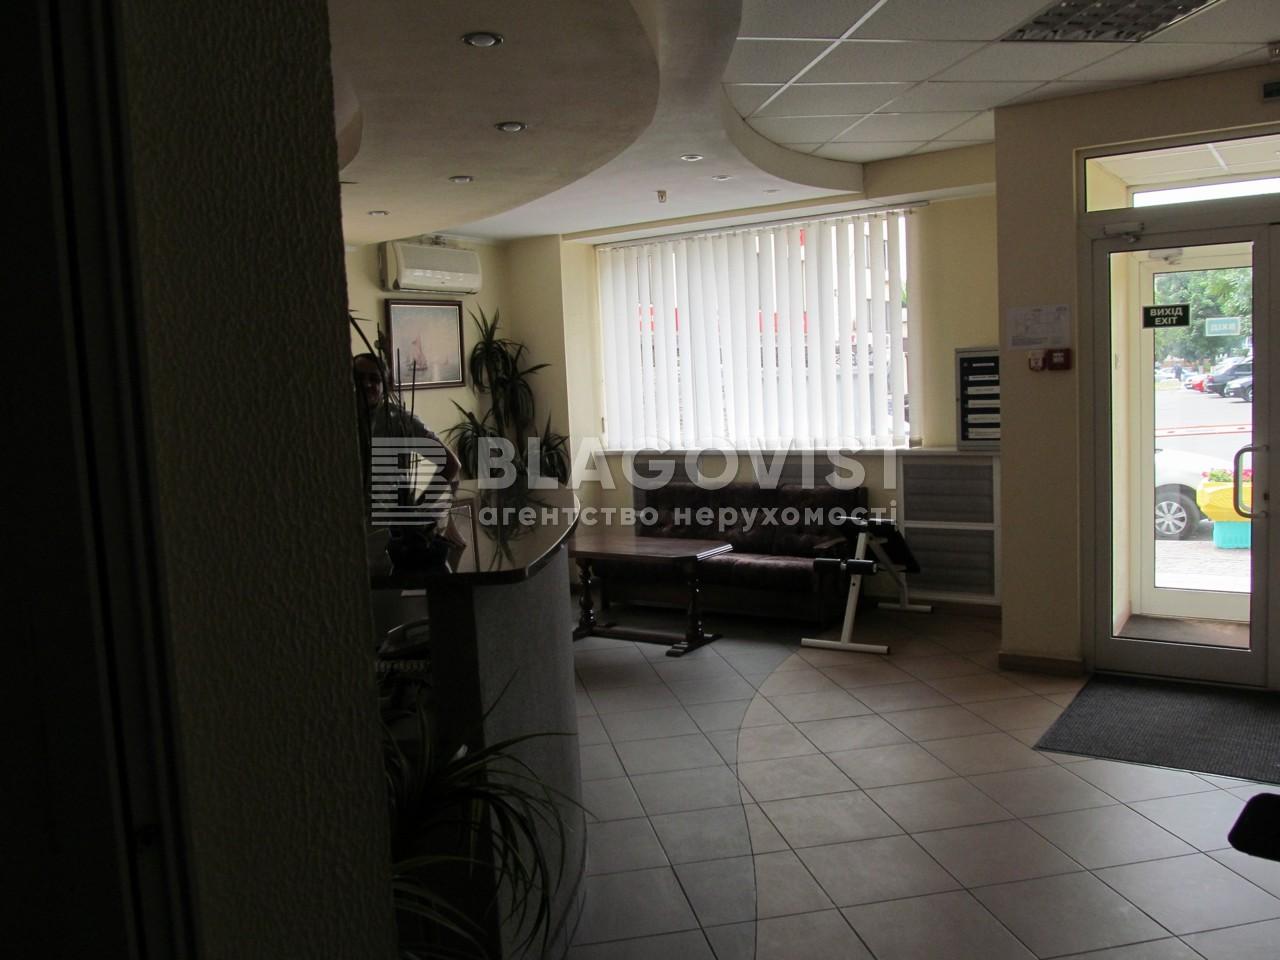 Офисно-складское помещение, F-33728, Скляренко Семена, Киев - Фото 17